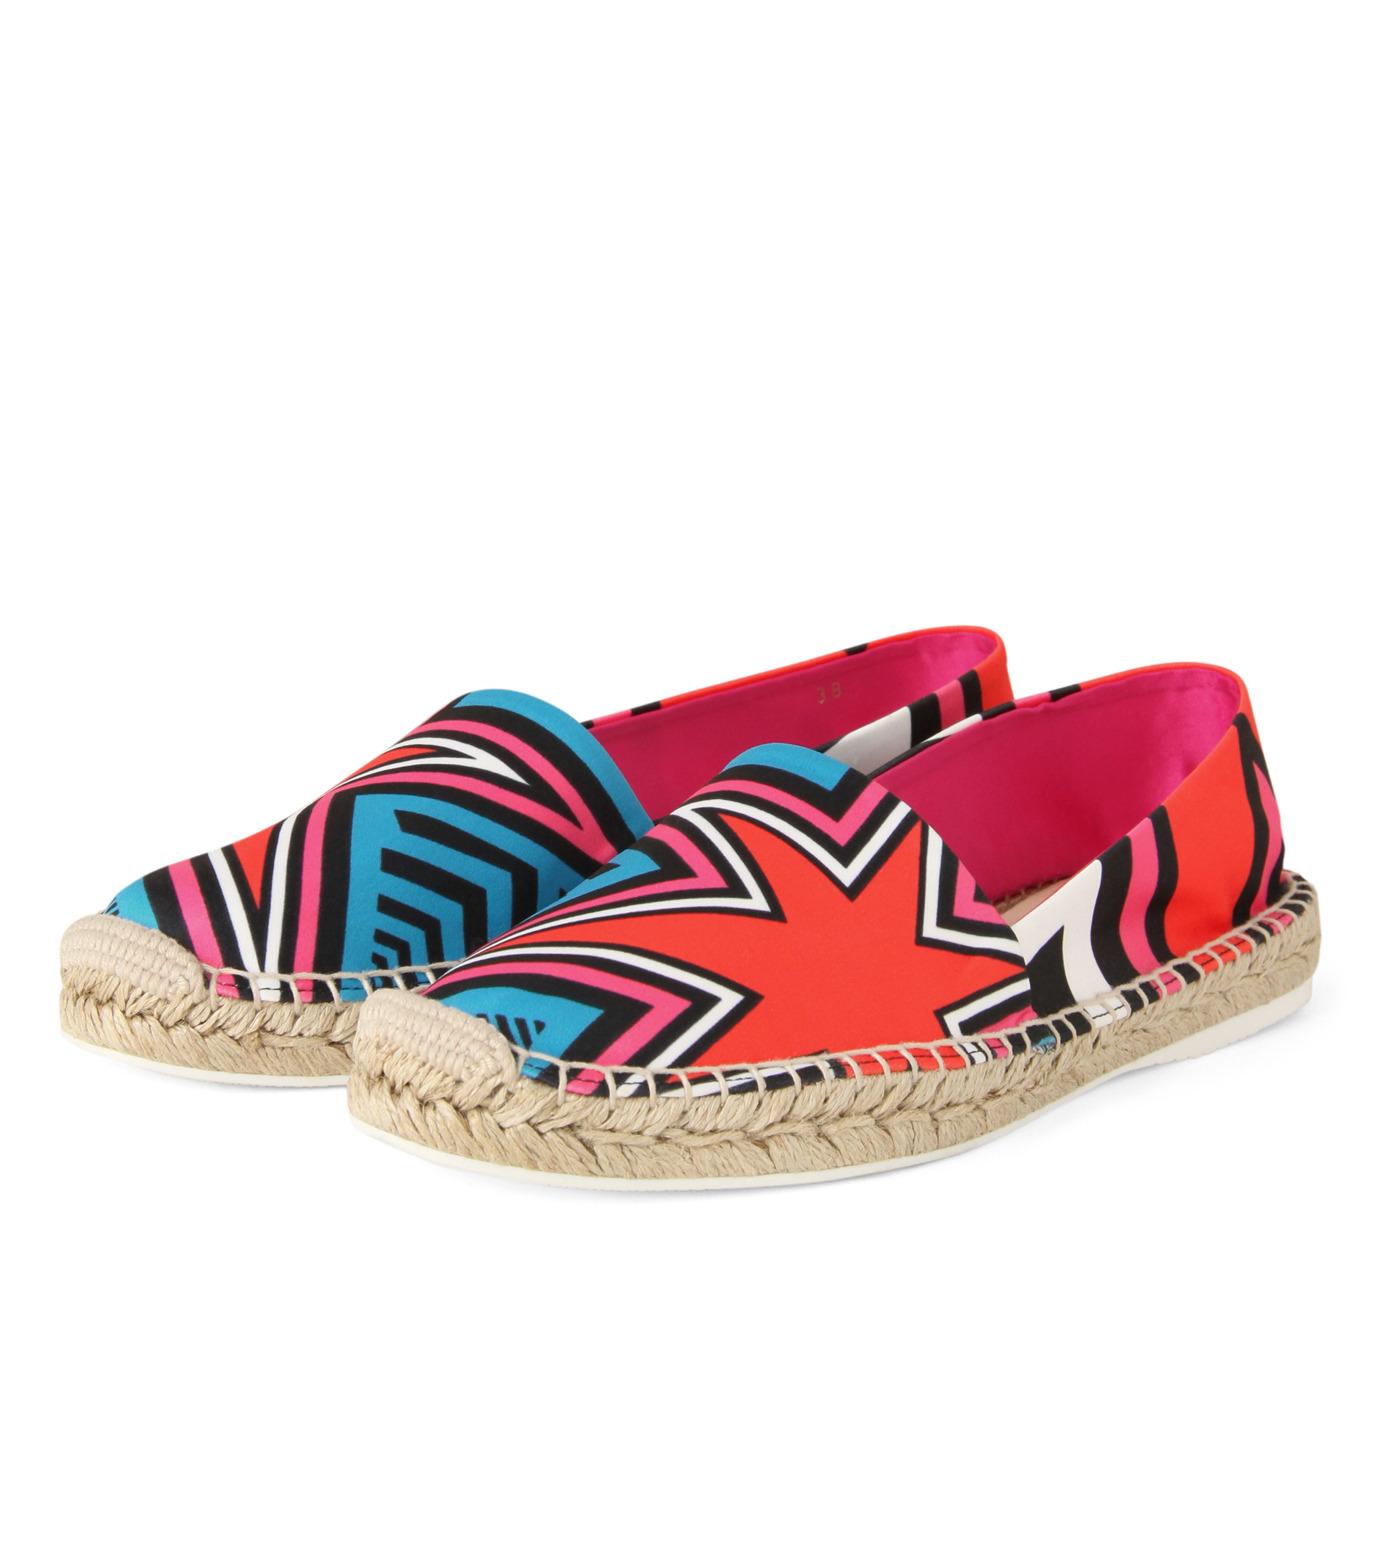 Nicholas  Kirkwood(ニコラス カークウッド)のEspadrille Loafer-MULTI COLOUR(シューズ/shoes)-15SF012-9 拡大詳細画像3